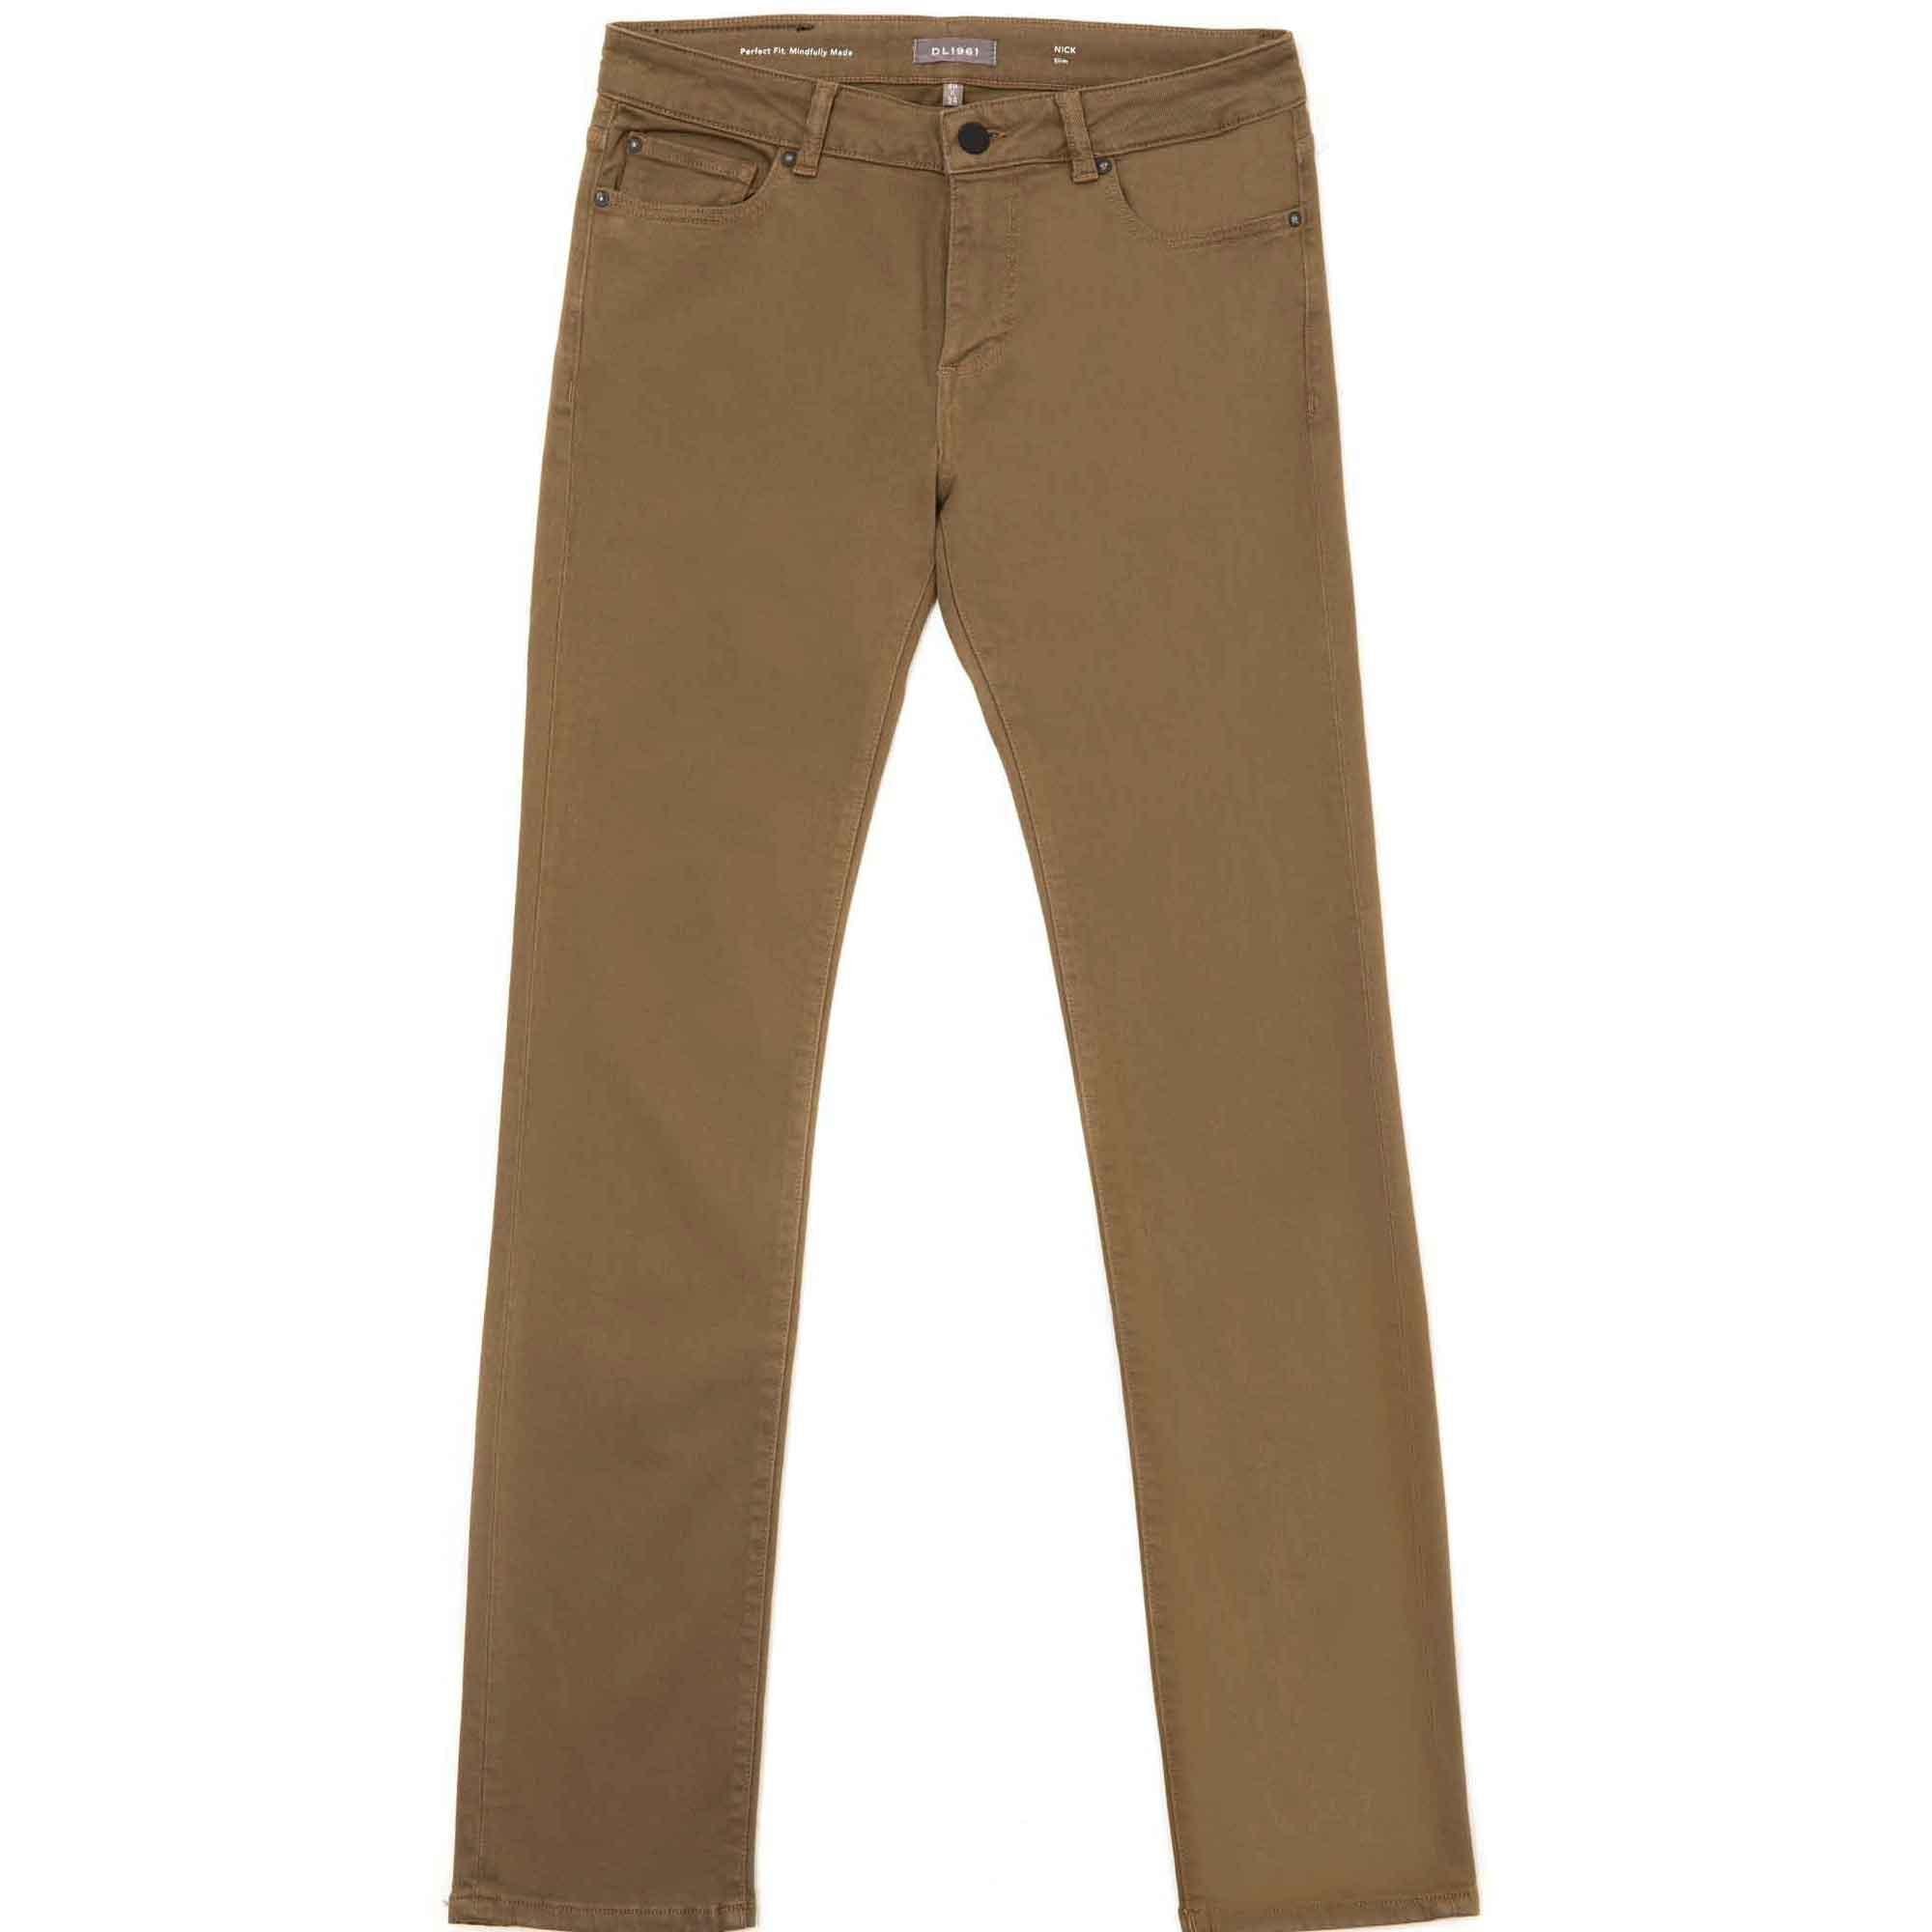 Jeans slim nick olive drab